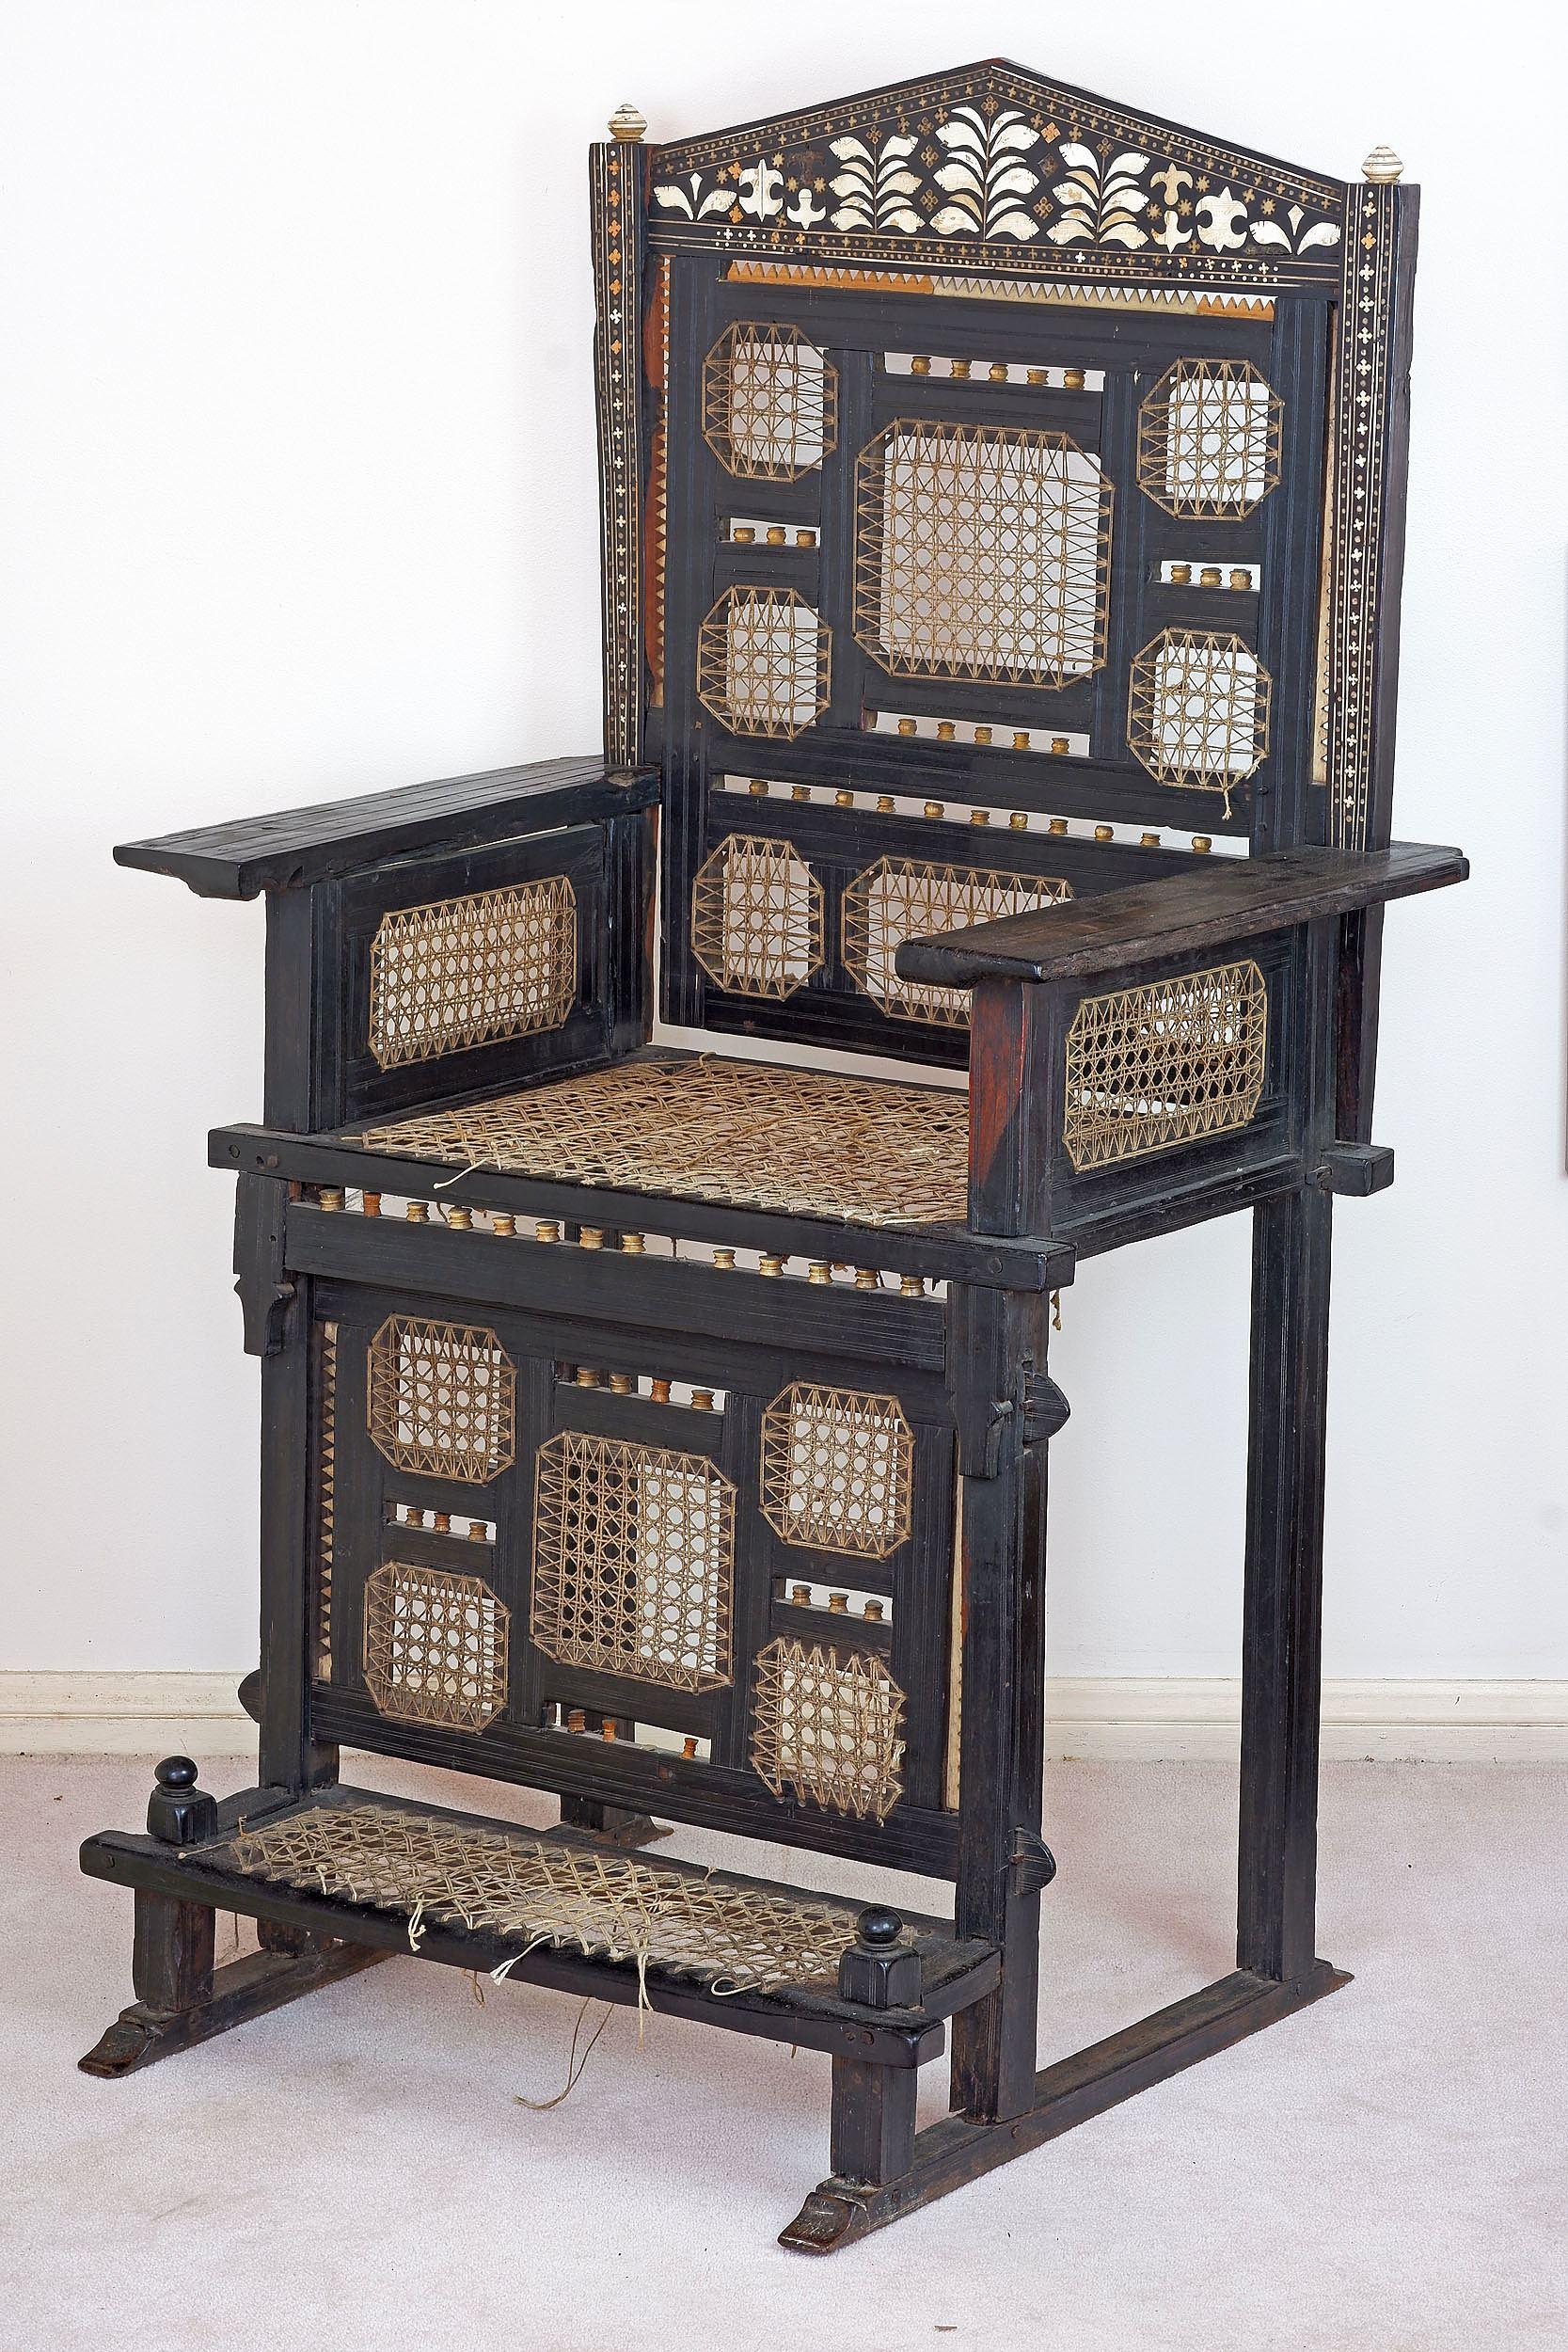 'Important East African Swahili Coast Ivory and Bone Embellished Ebony Throne Chair, Kita Cha Enzi, 19th Century'